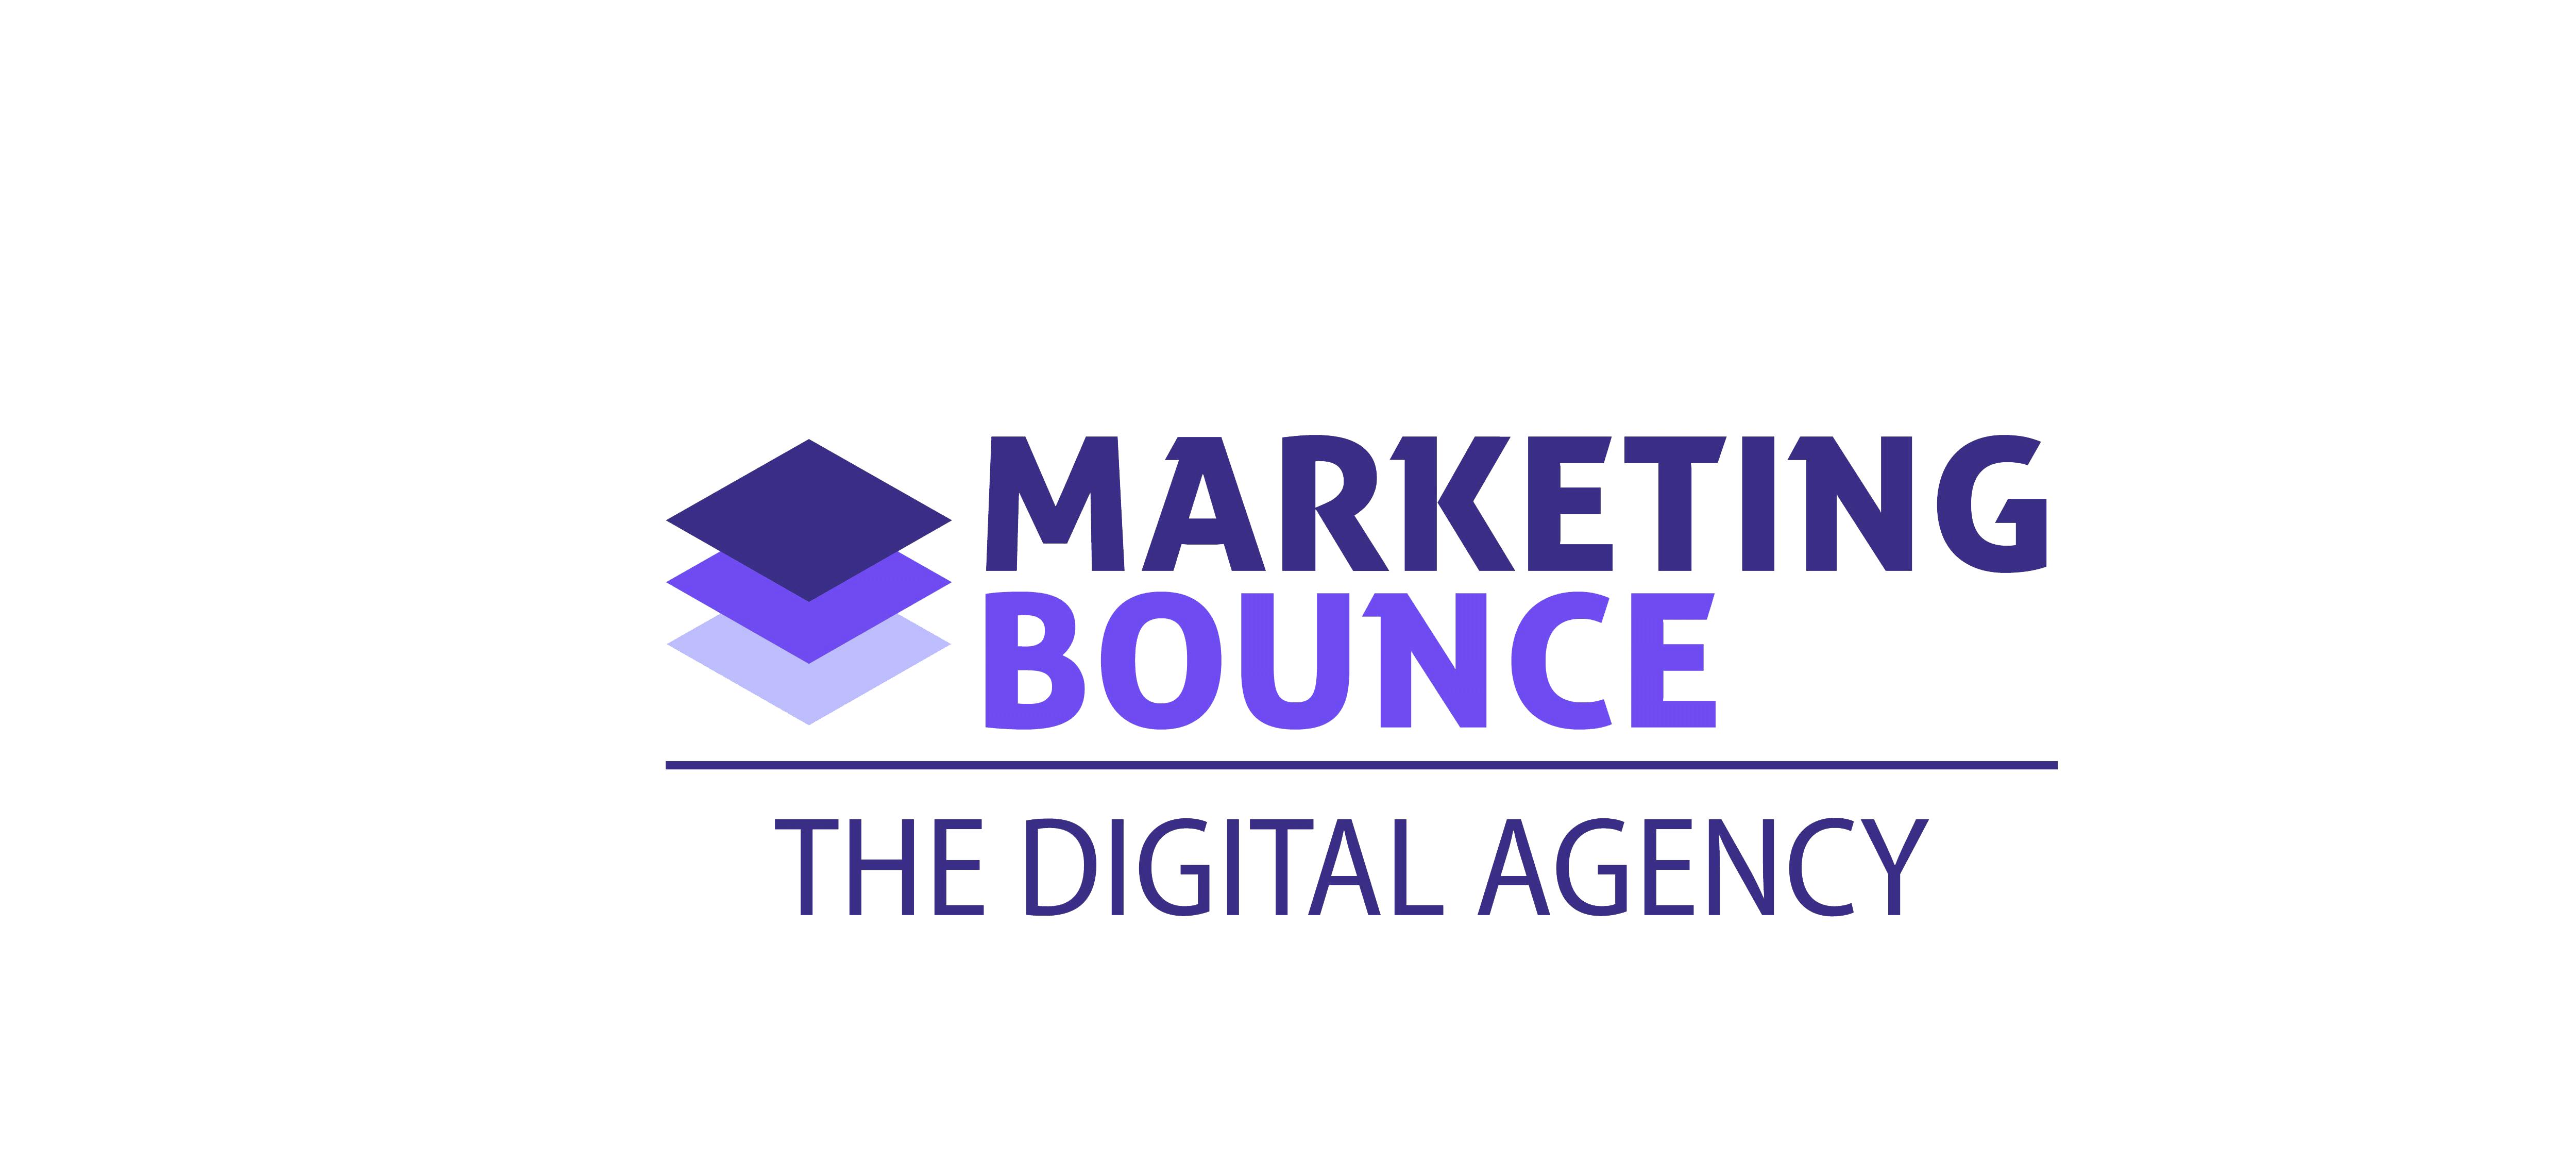 marketing bounce logo